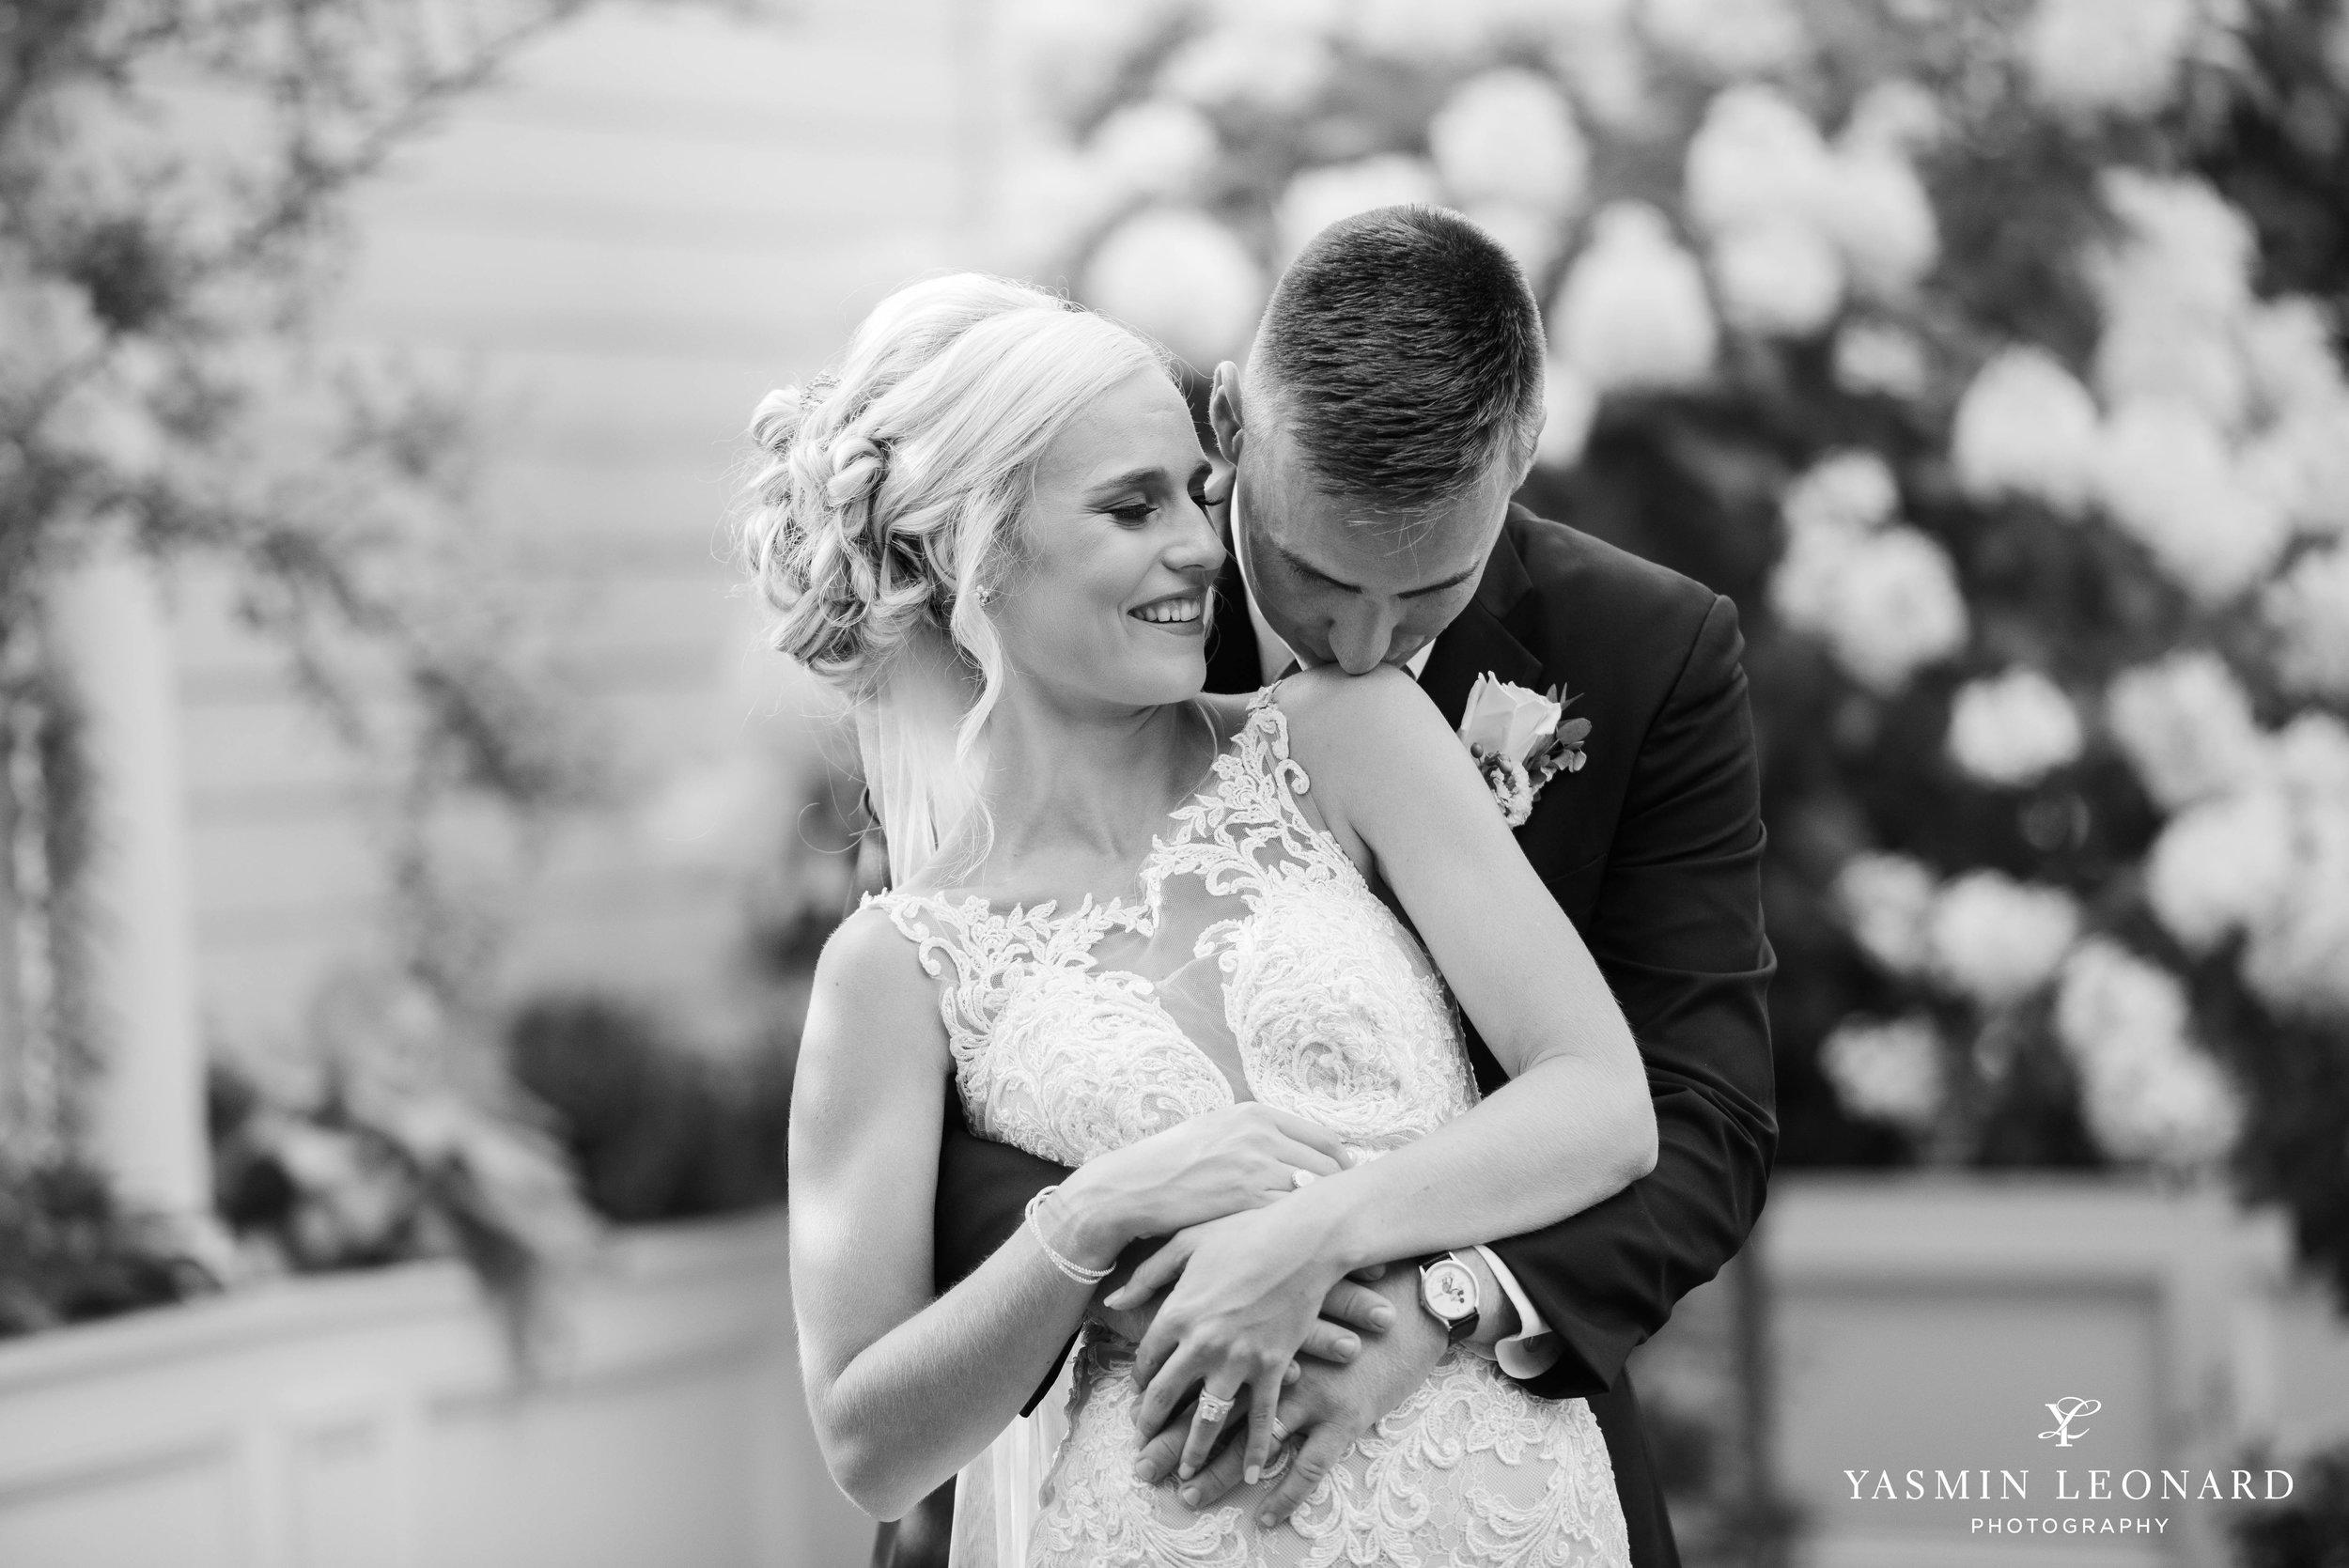 Separk Mansion - NC Weddings - Gastonia Wedding - NC Wedding Venues - Pink and Blue Wedding Ideas - Pink Bridesmaid Dresses - Yasmin Leonard Photography-34.jpg